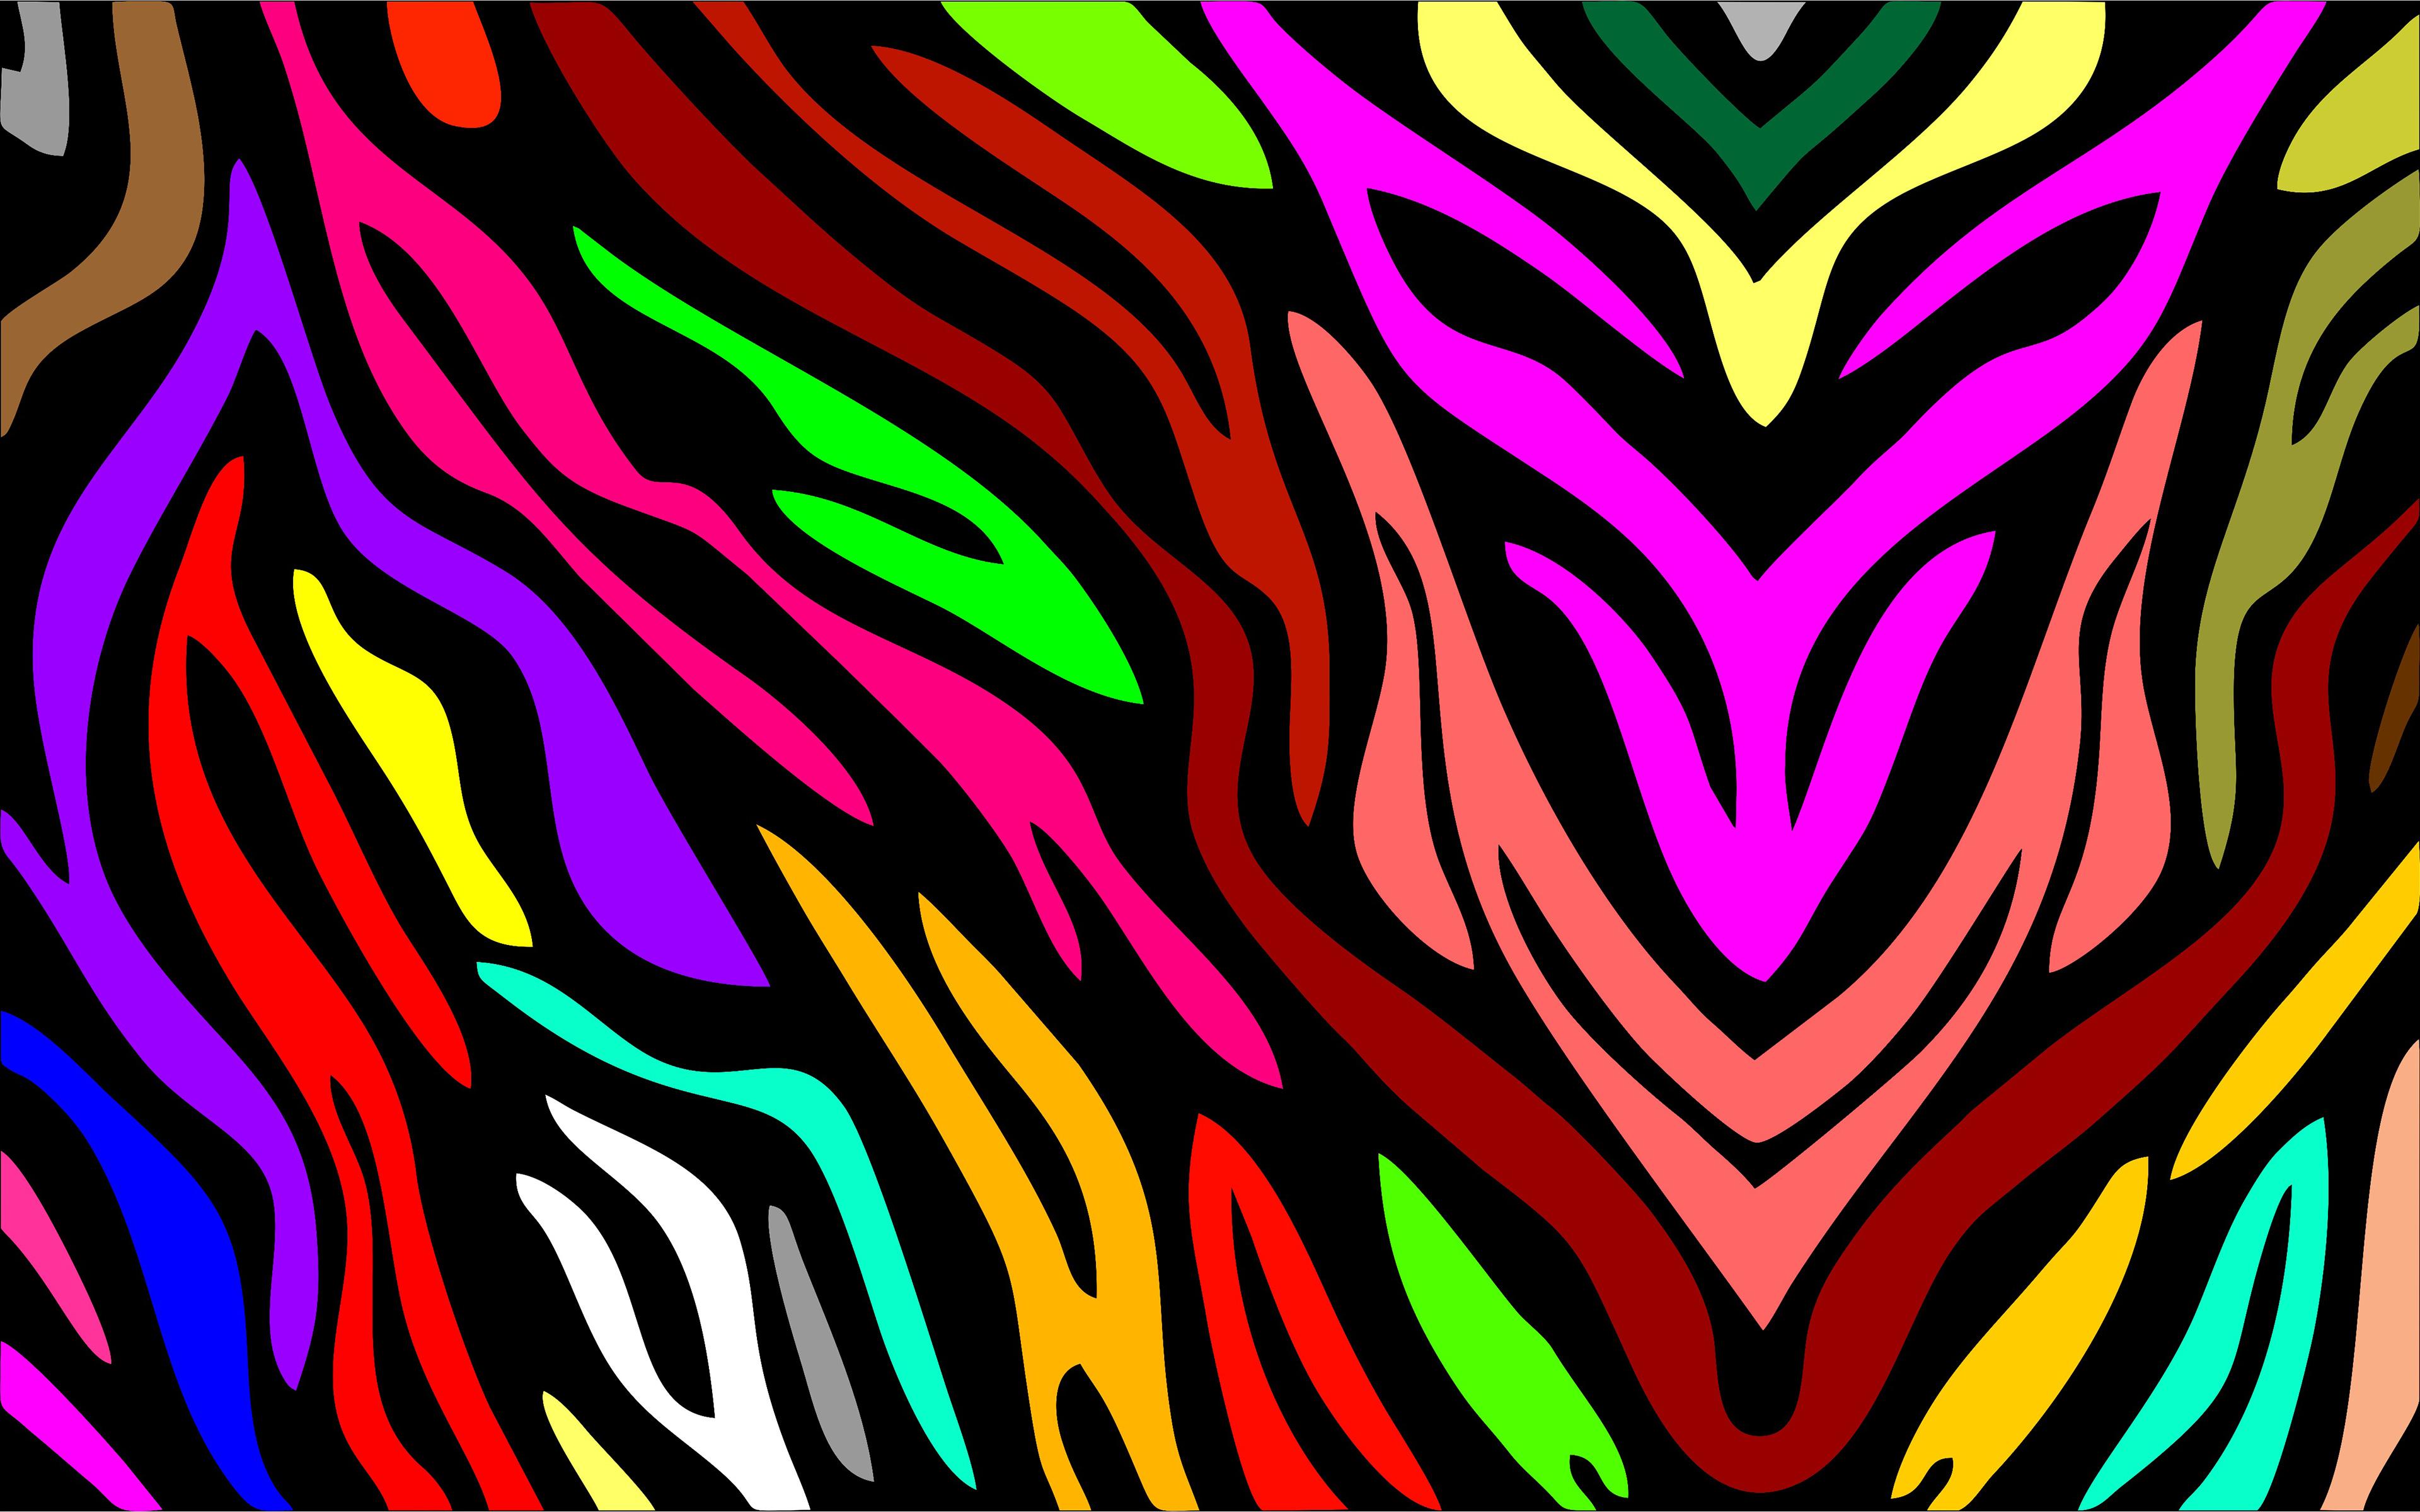 Abstract Colors Flashy Bird 4k: Colors 4k Ultra HD Wallpaper